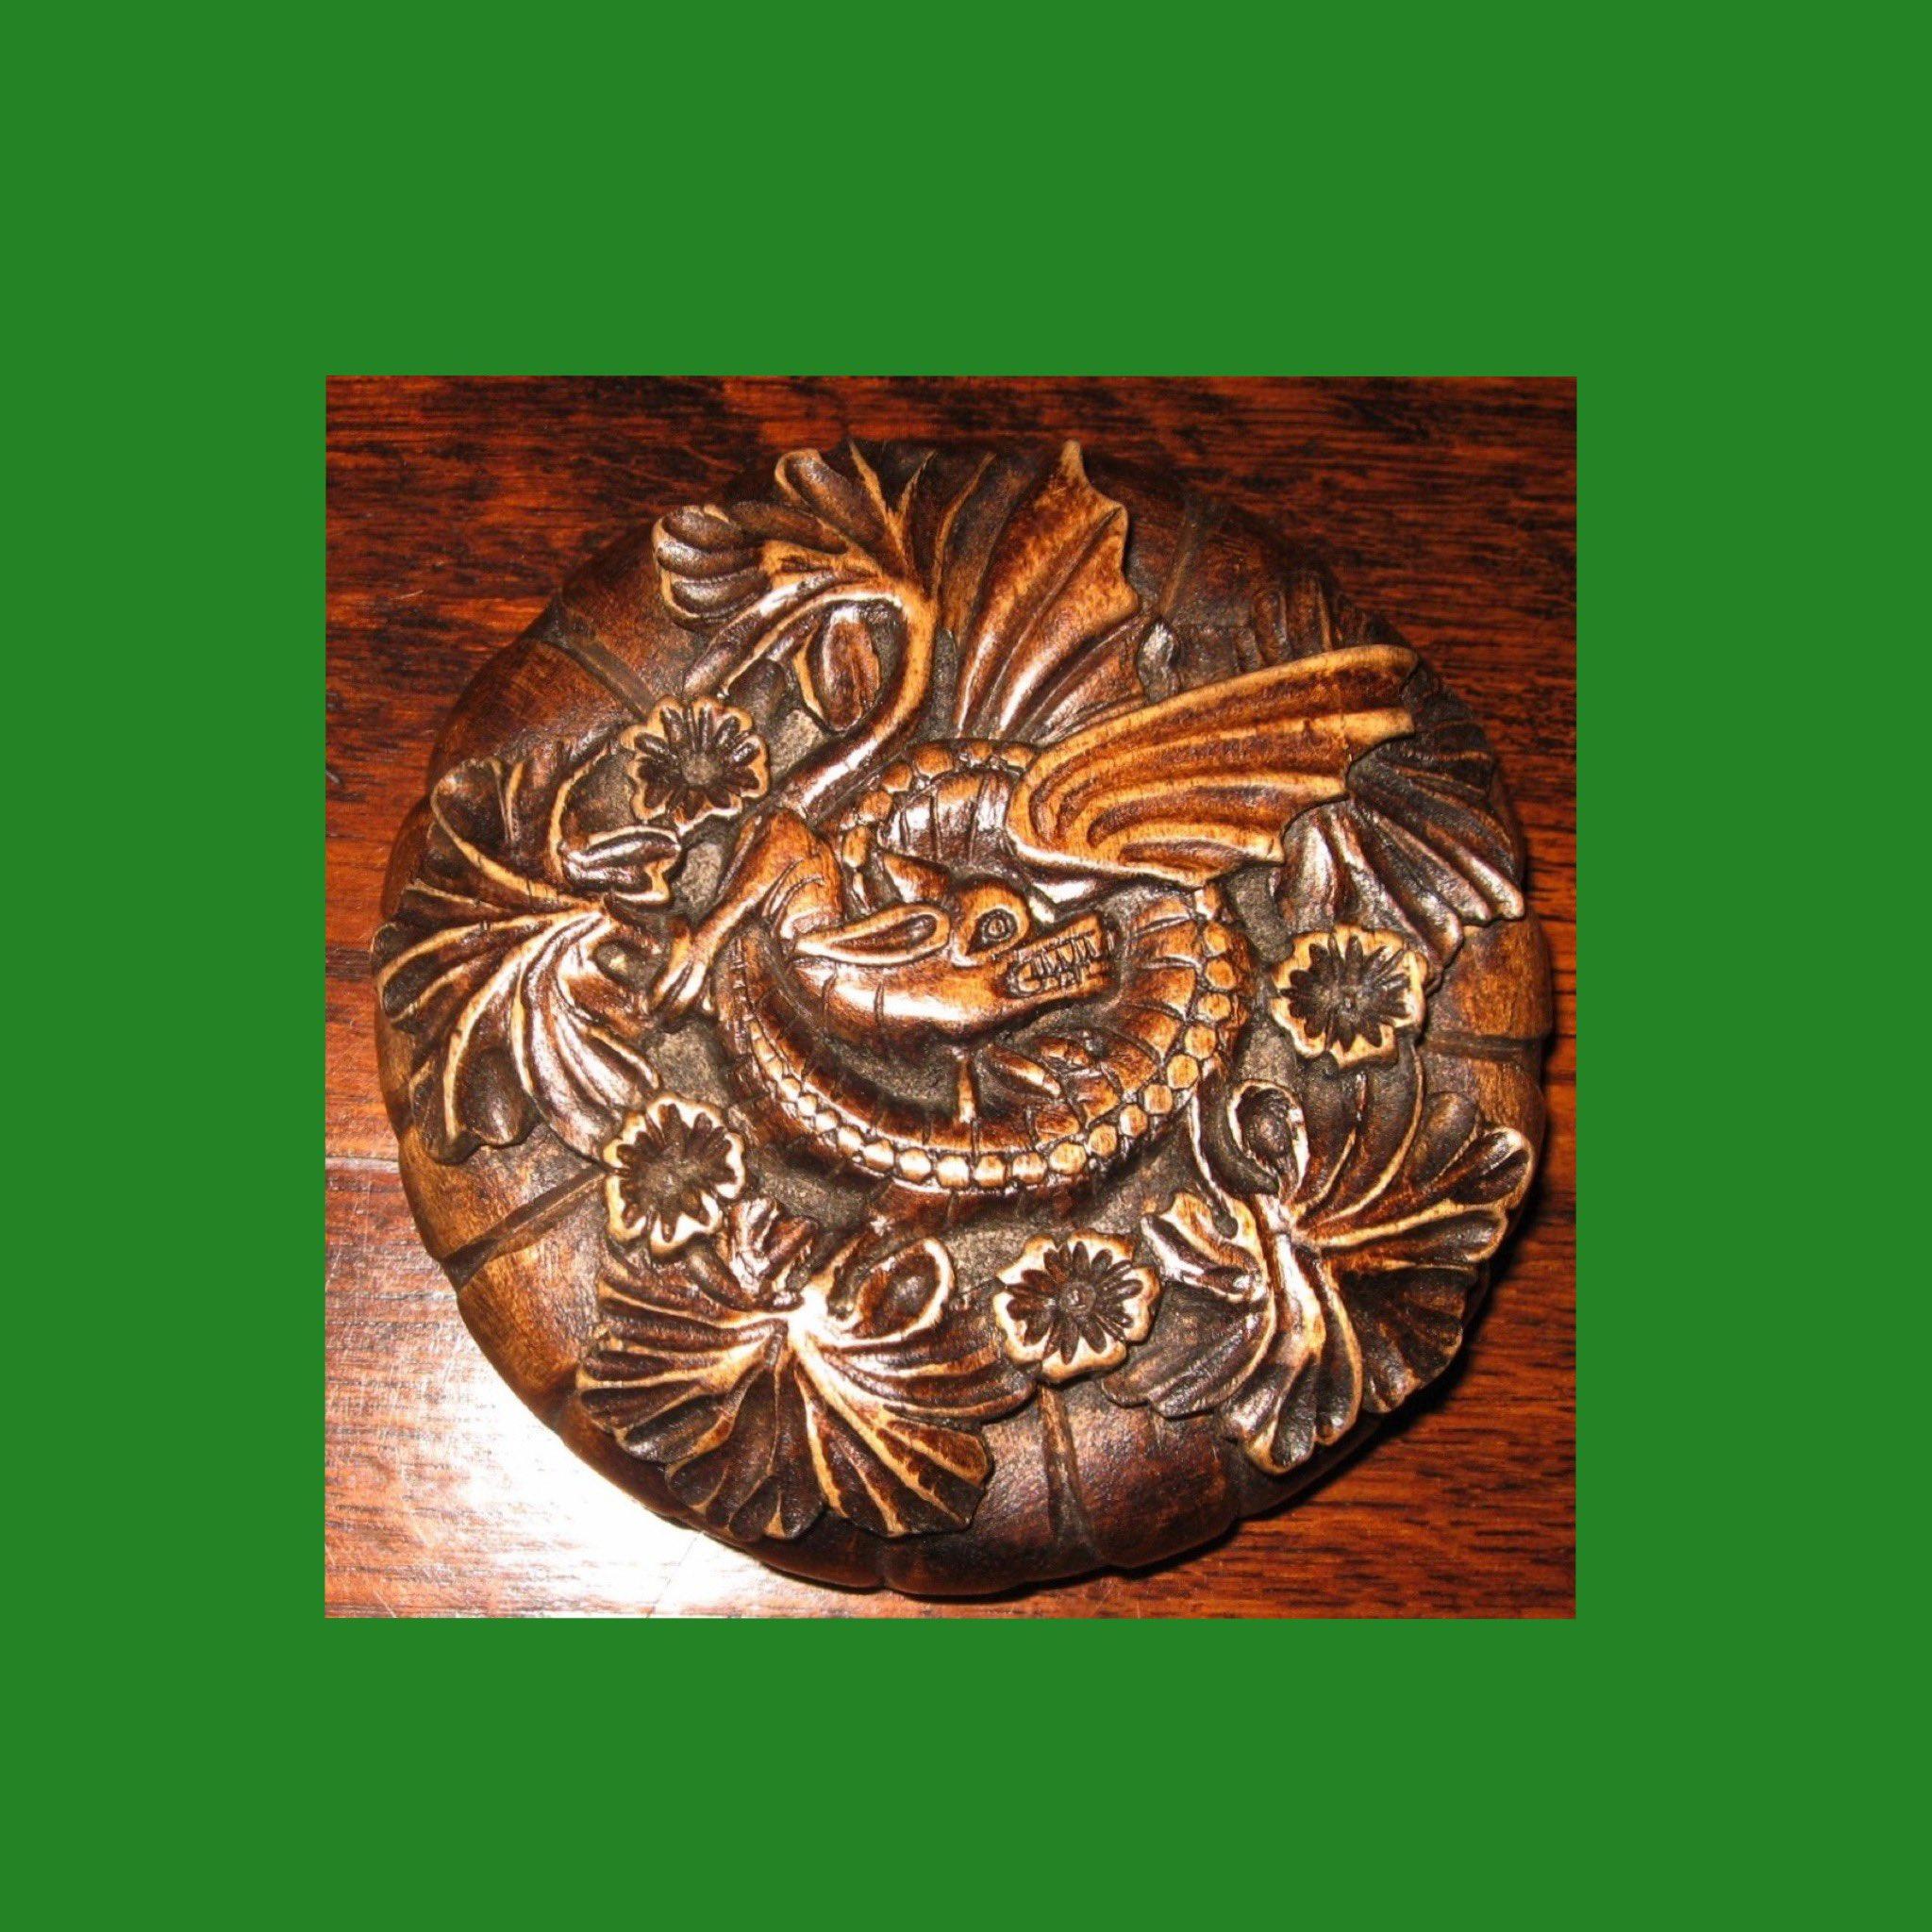 Dragons eye lime 4 inch diameter one off  Keeper😊 https://t.co/pSaDg7m5h2